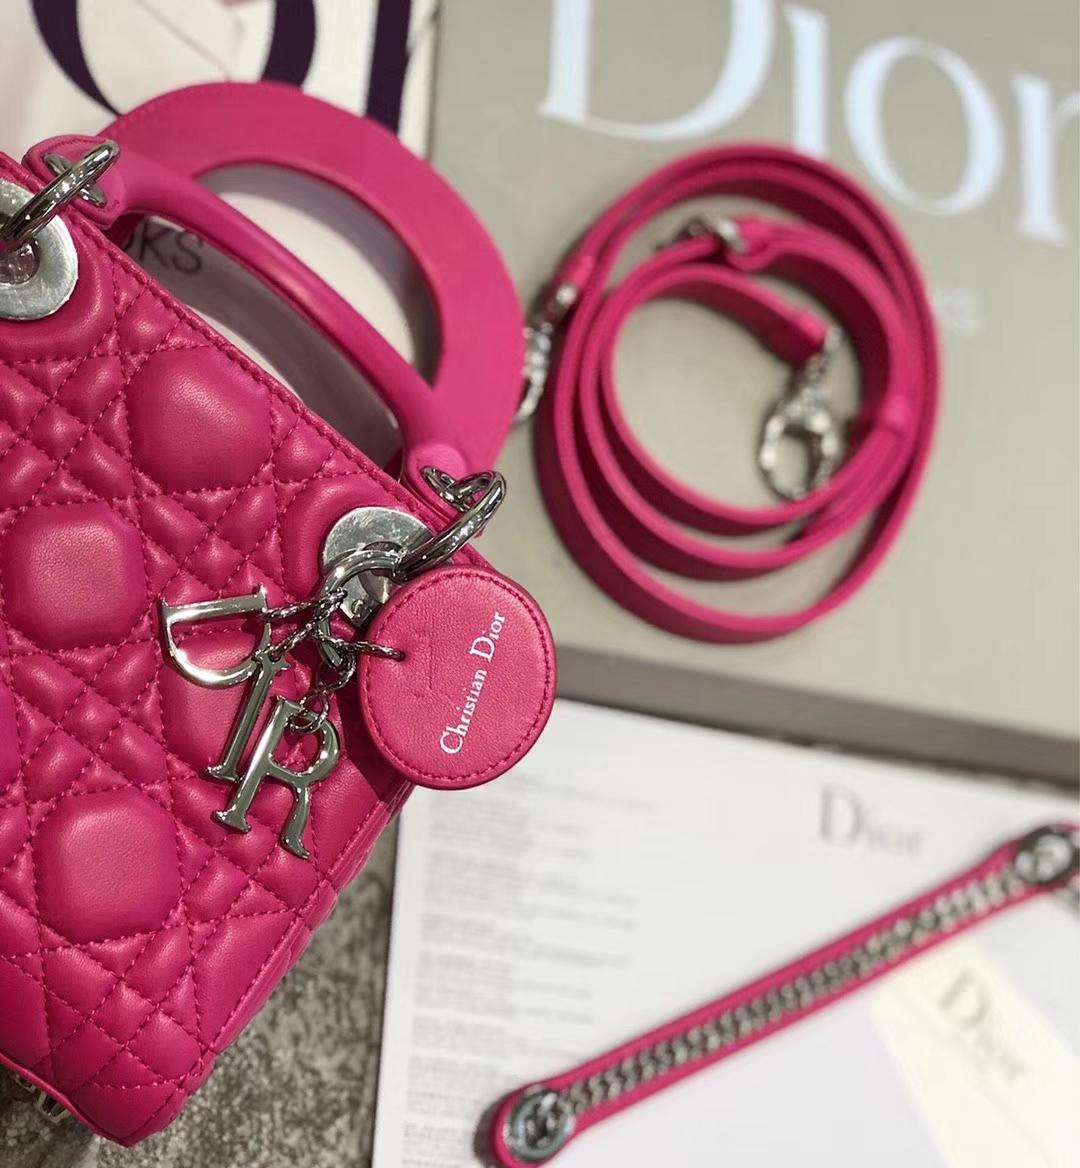 Mini Lady Dior 迪奥经典羊皮三格戴妃包链条单肩斜挎女包17CM 玫红色银扣